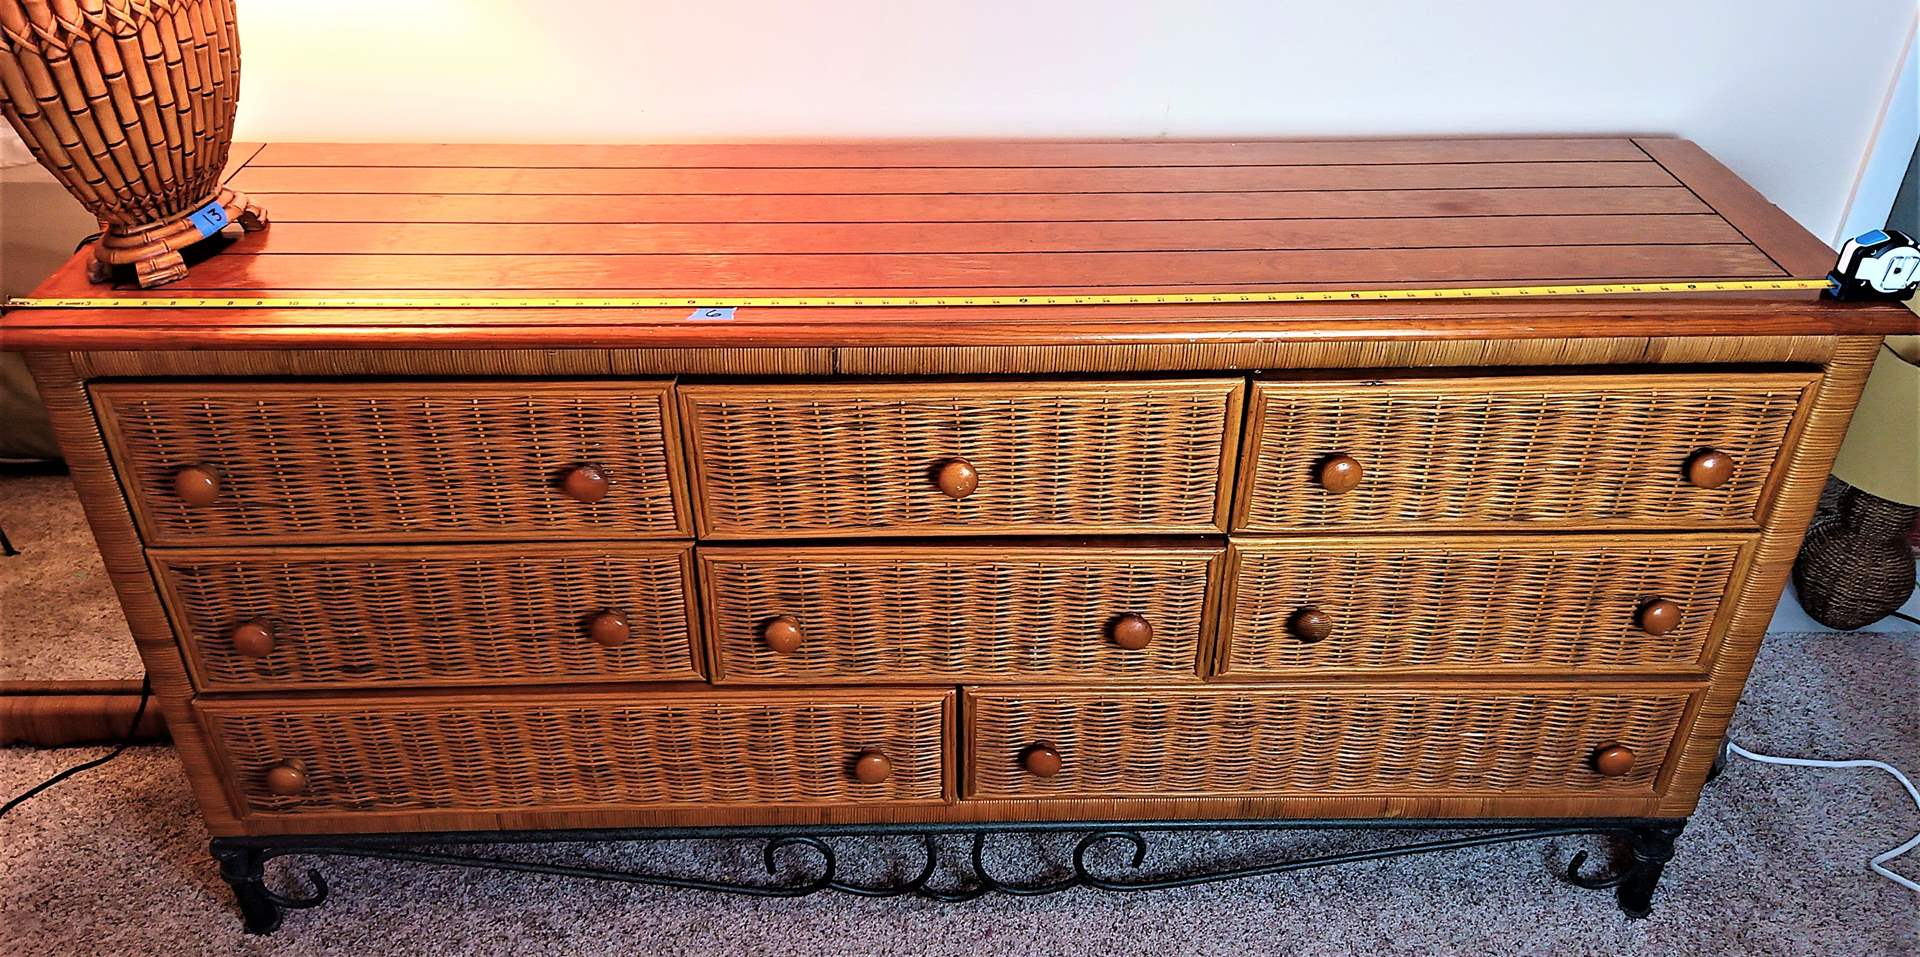 "Lot # 6 Wood, Wicker and Metal Legs & Trim 8 Drawer Dresser.  68""x18""x32"" high"